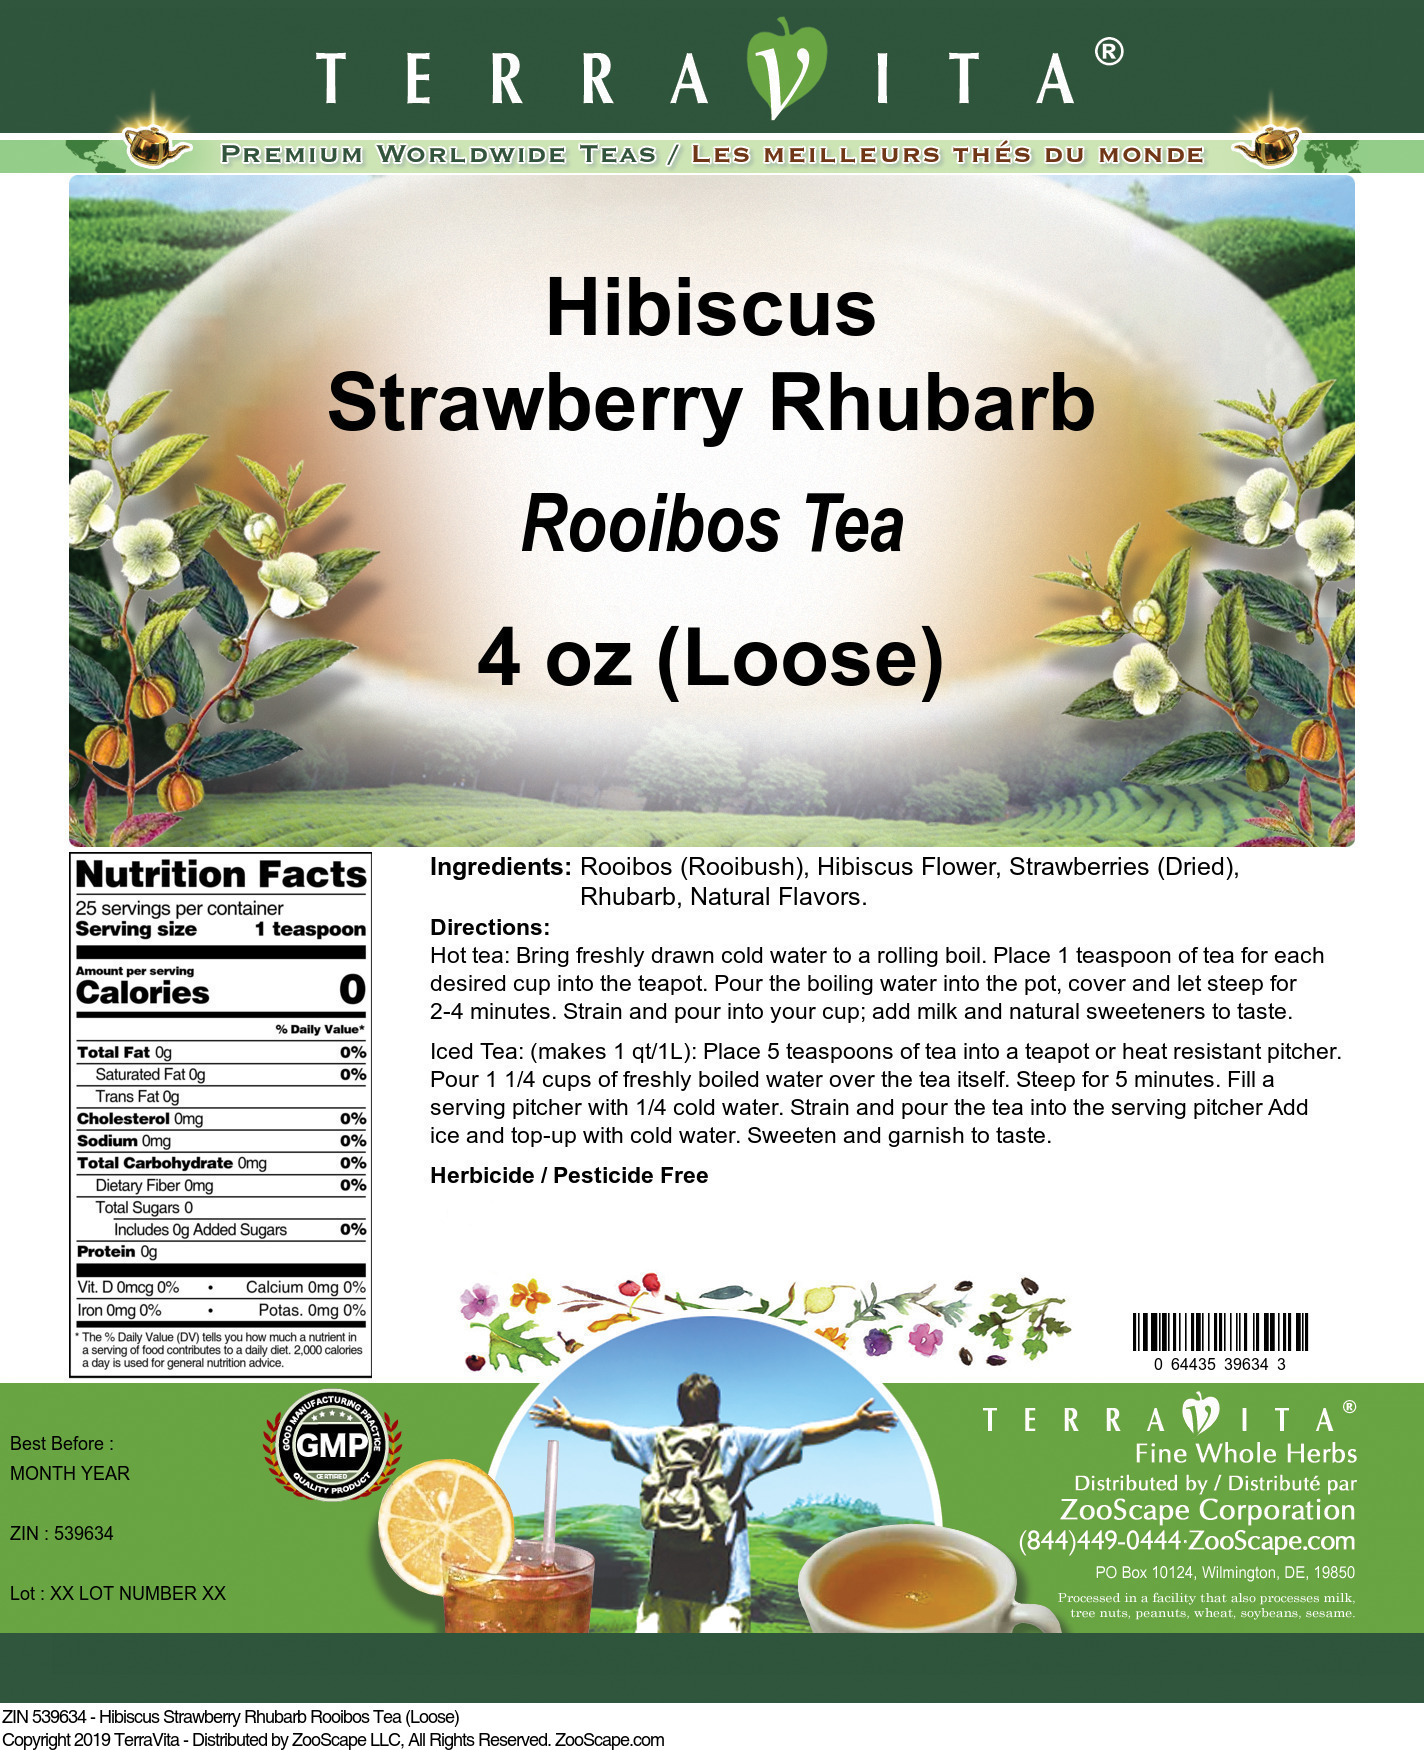 Hibiscus Strawberry Rhubarb Rooibos Tea